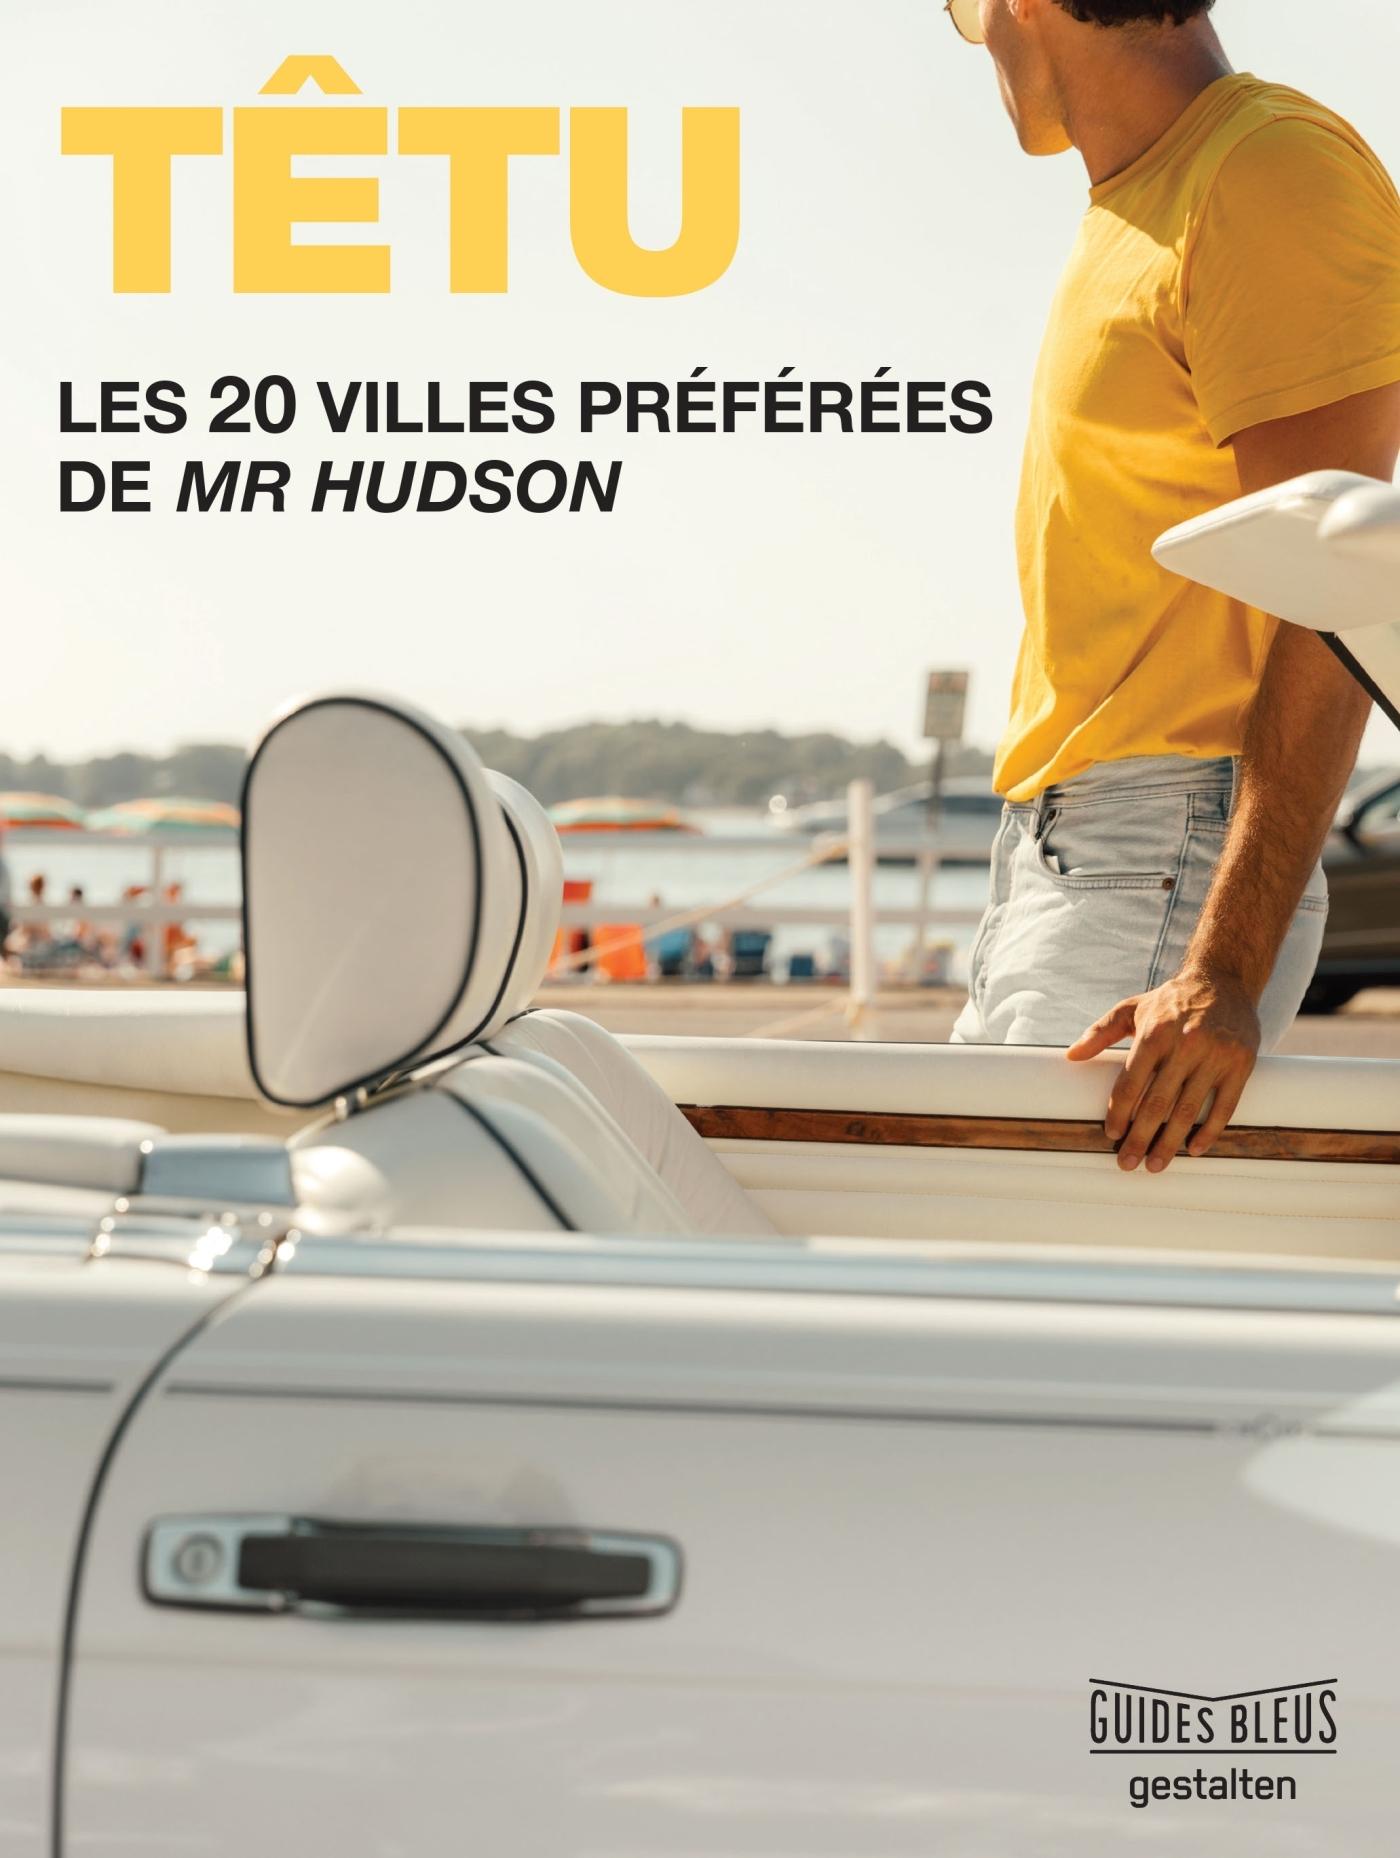 TETU LES 20 VILLES PREFEREES DE MR HUDSON